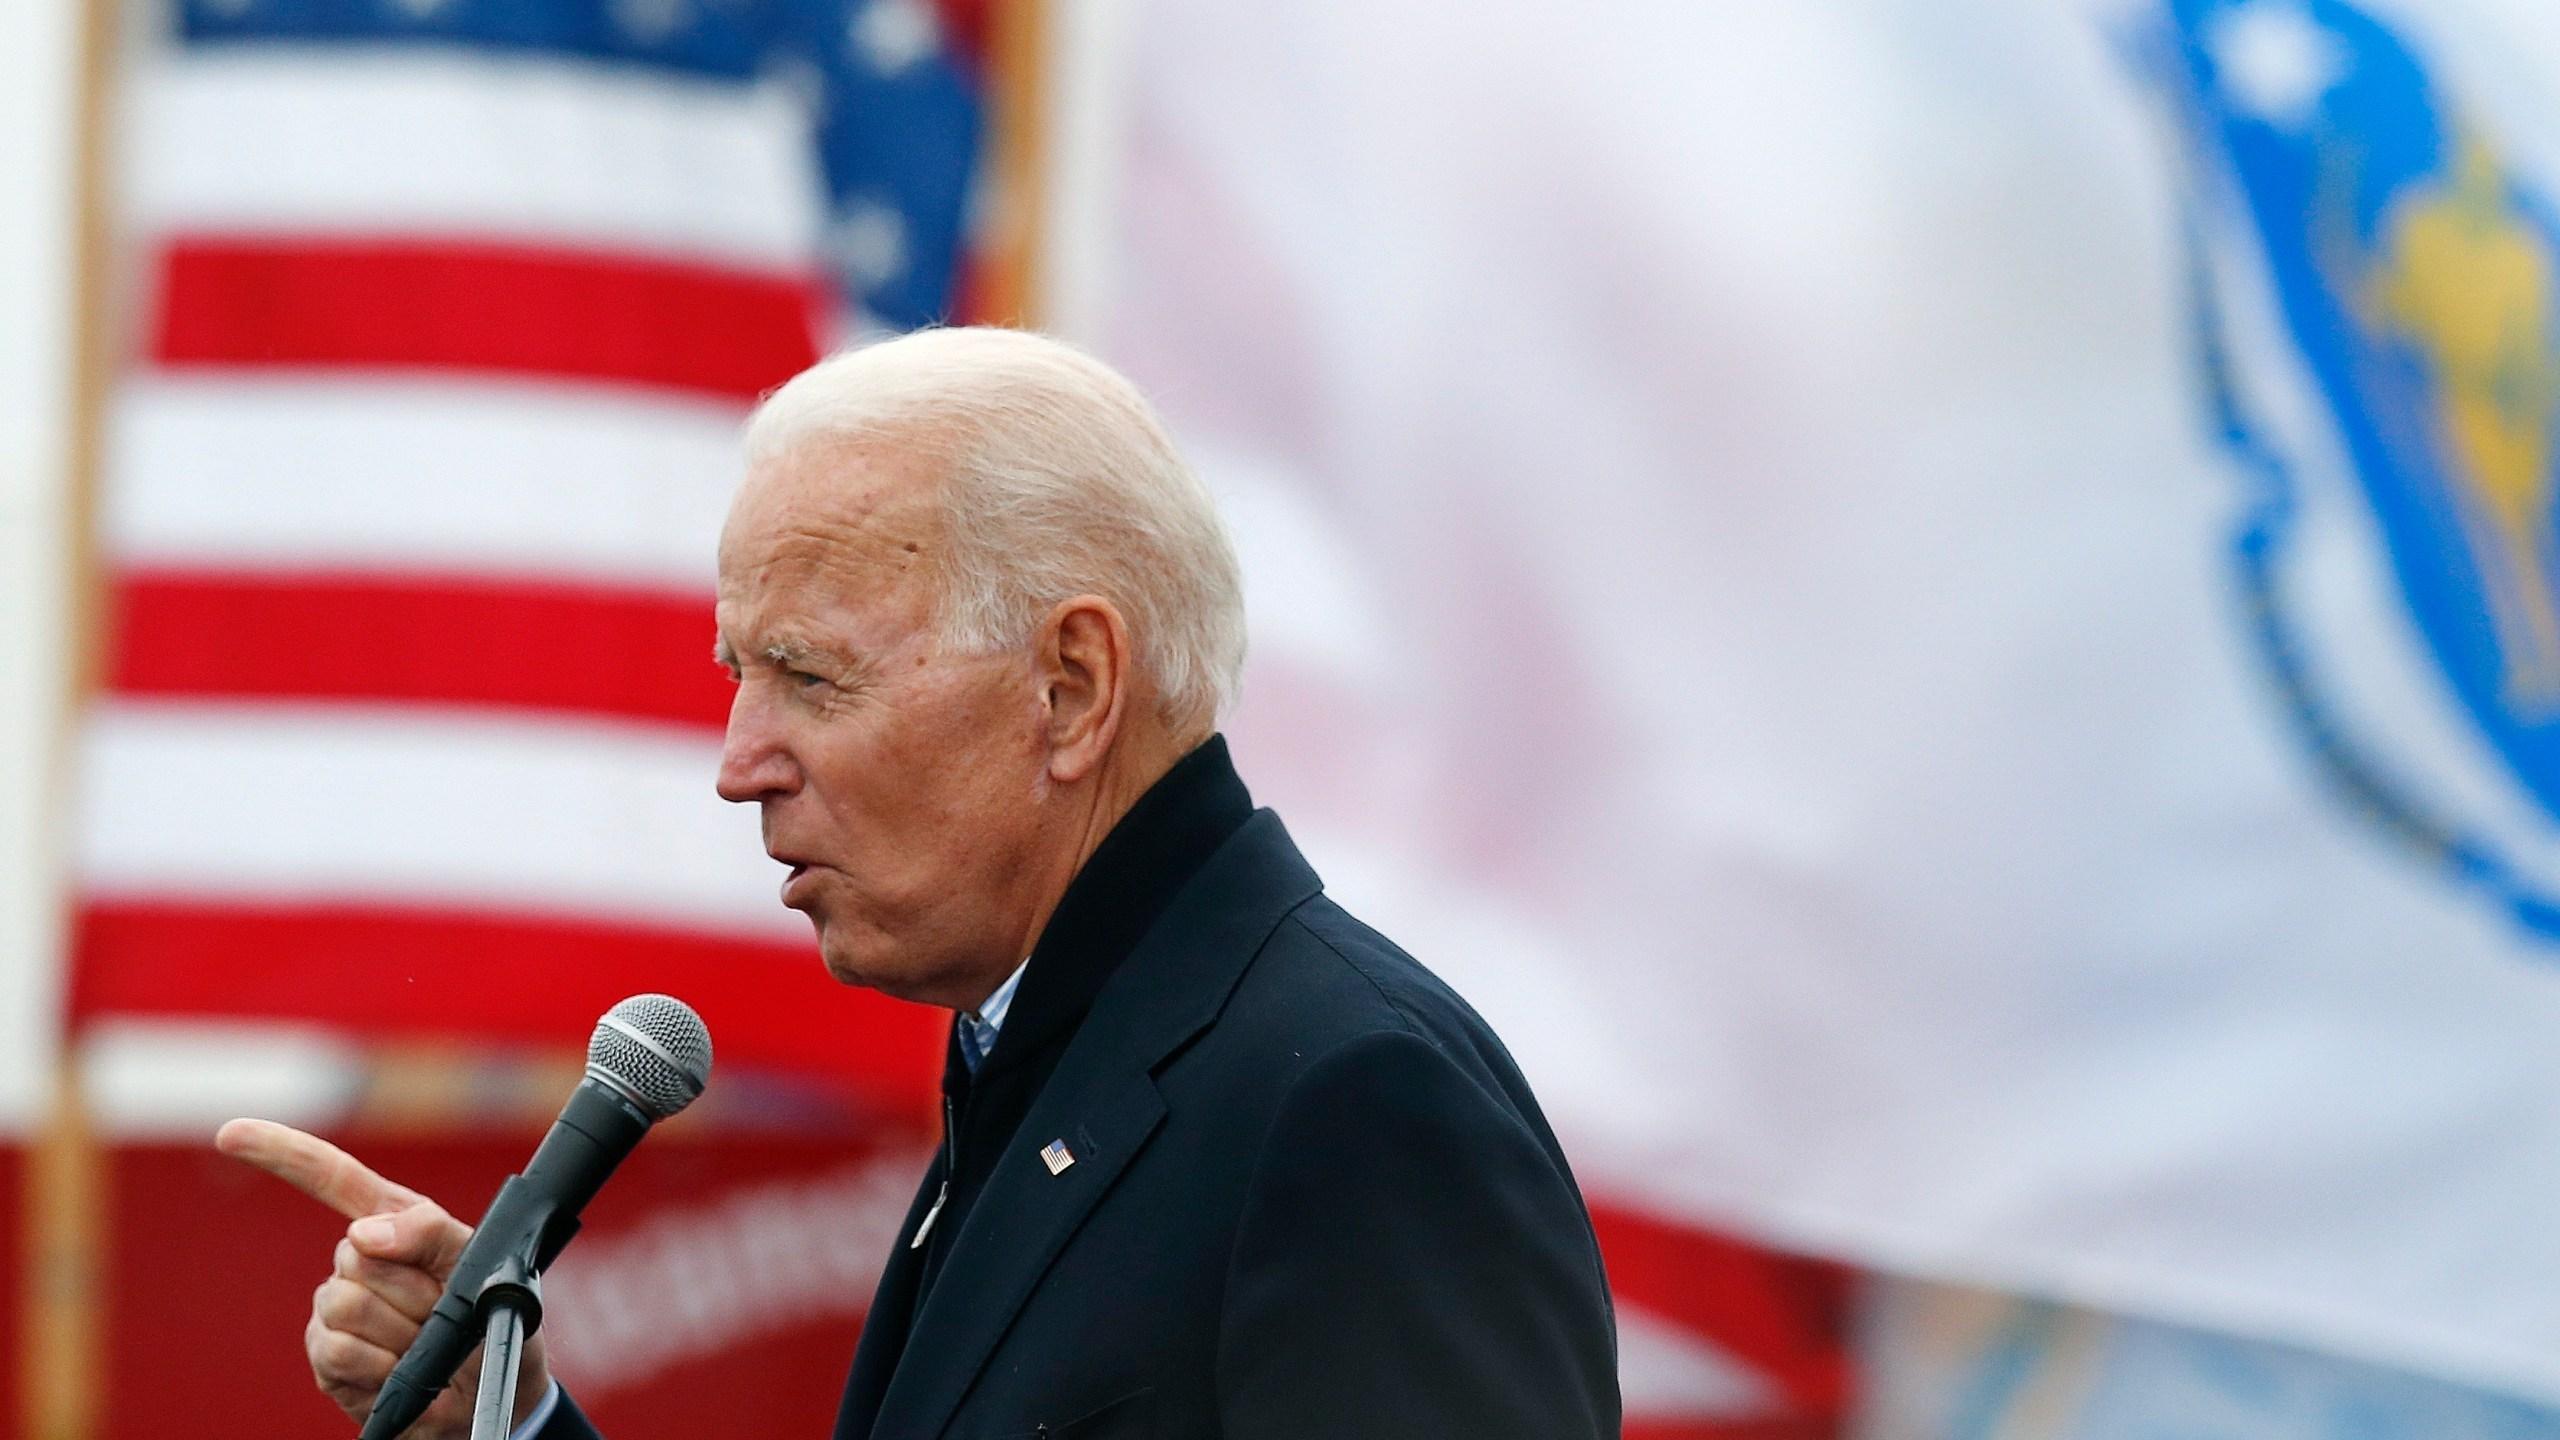 Election 2020 Joe Biden_American flag